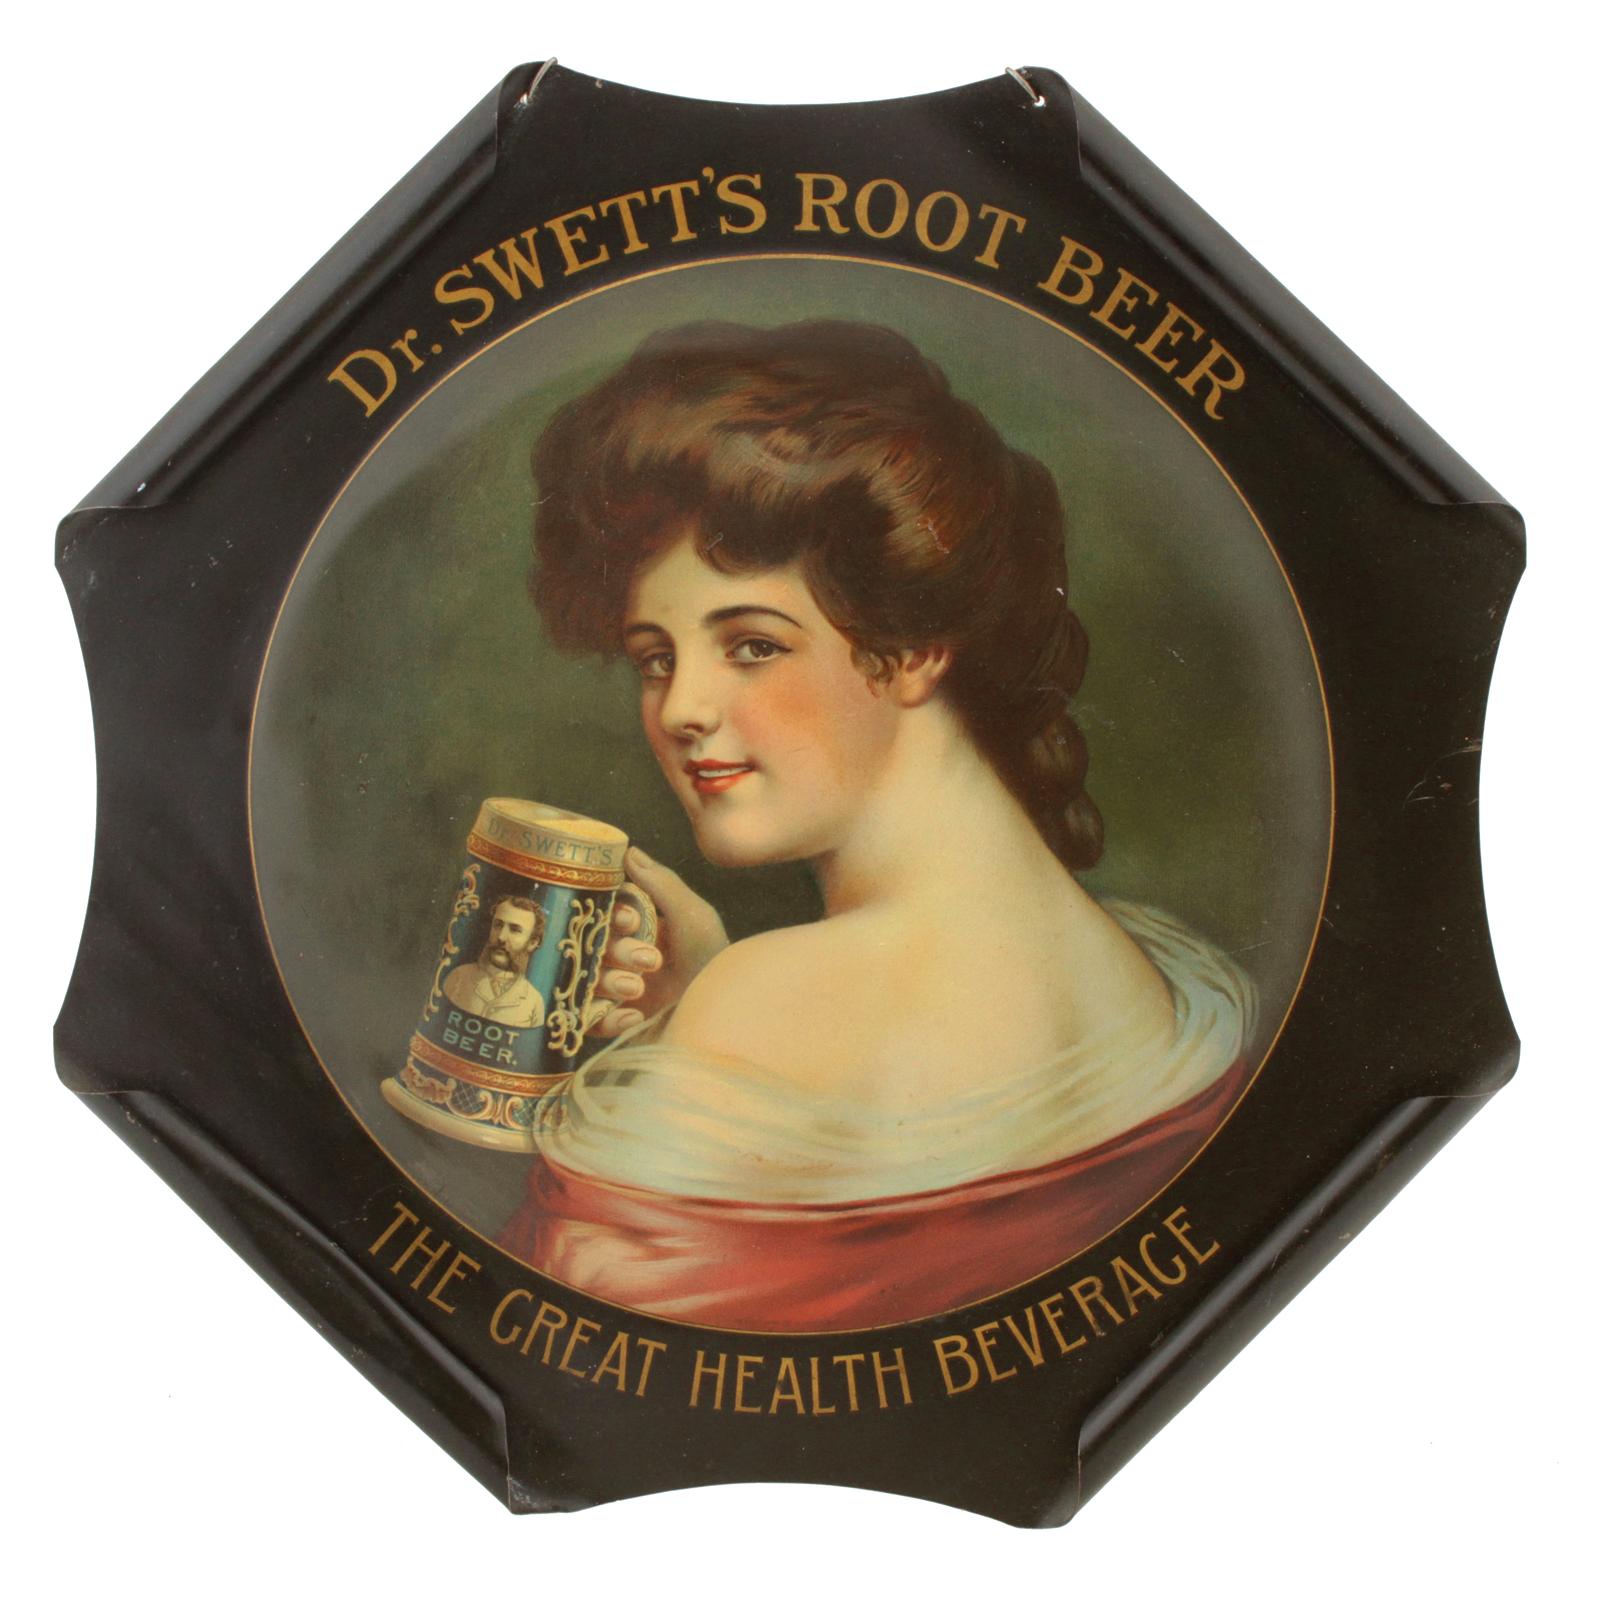 Dr. SwettÕs Root Beer Sign